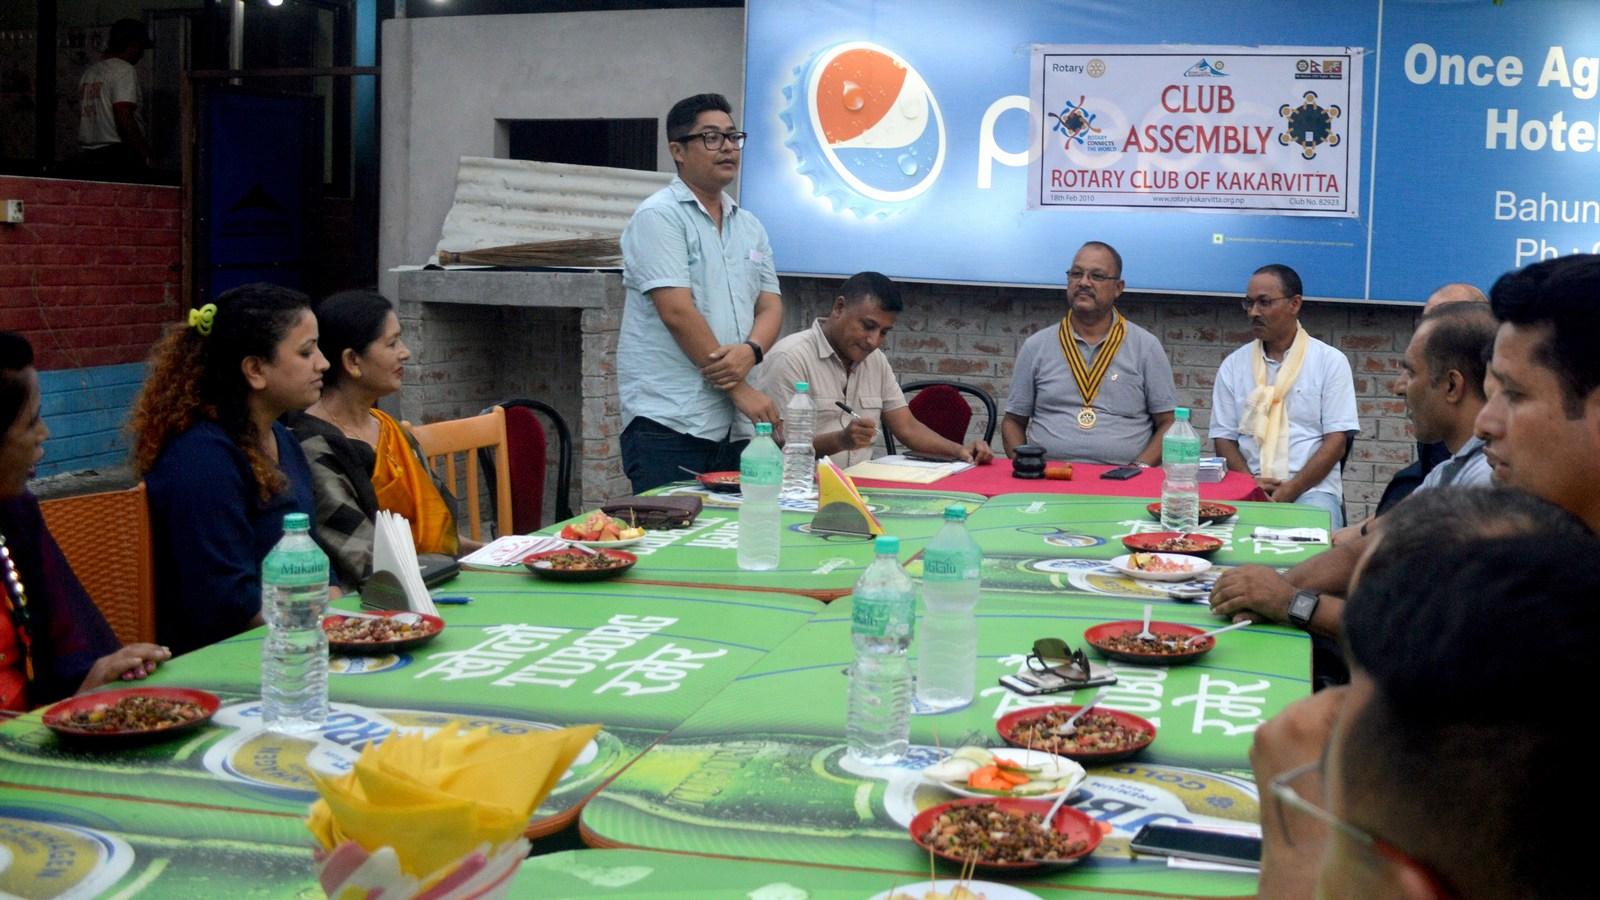 1st-Club-Assembly-2018-19-Rotary-Club-of-Kakarvitta-12